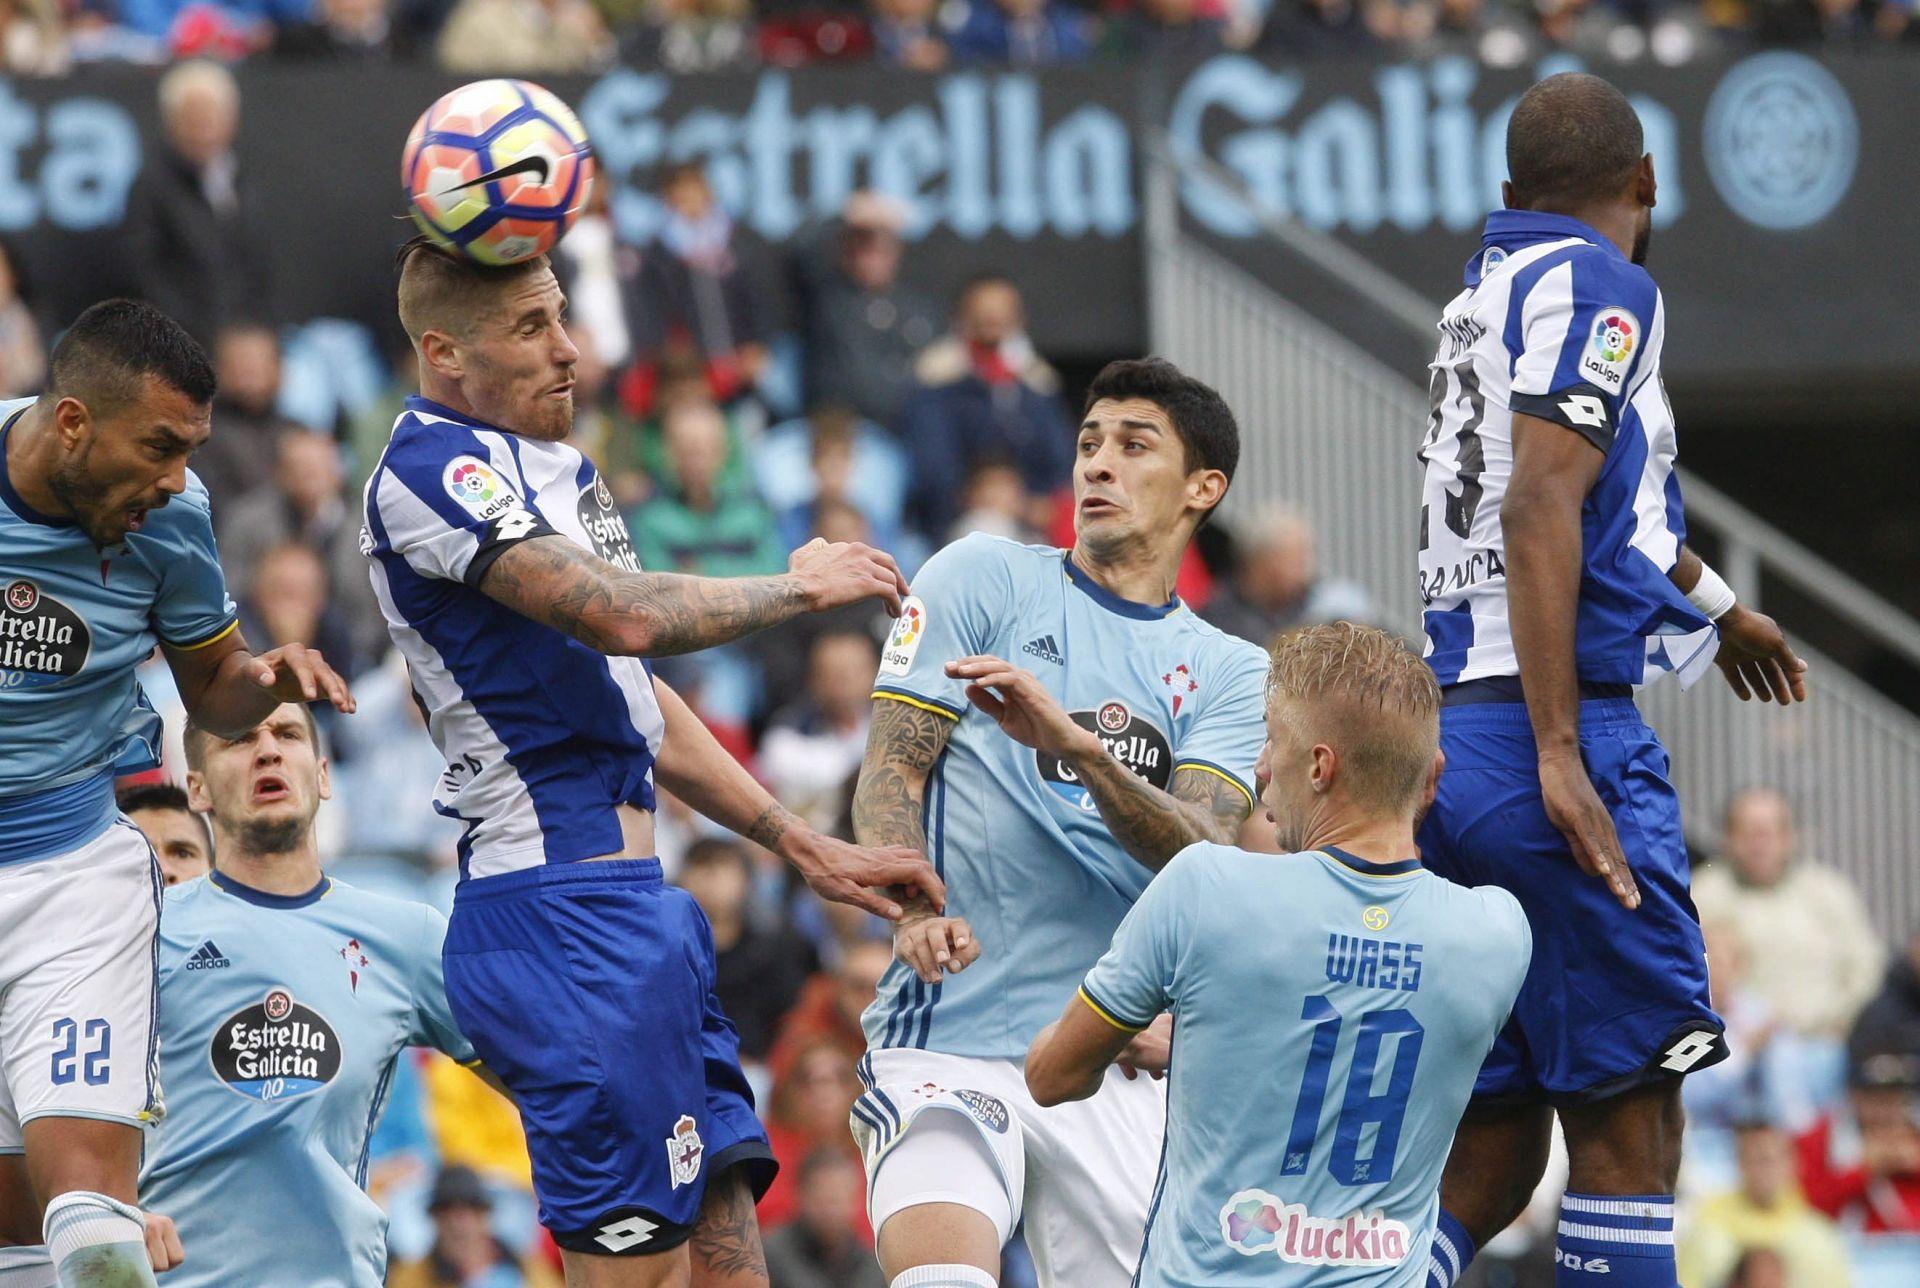 ŠPANJOLSKA: Celta Vigo – Deportivo 4:1